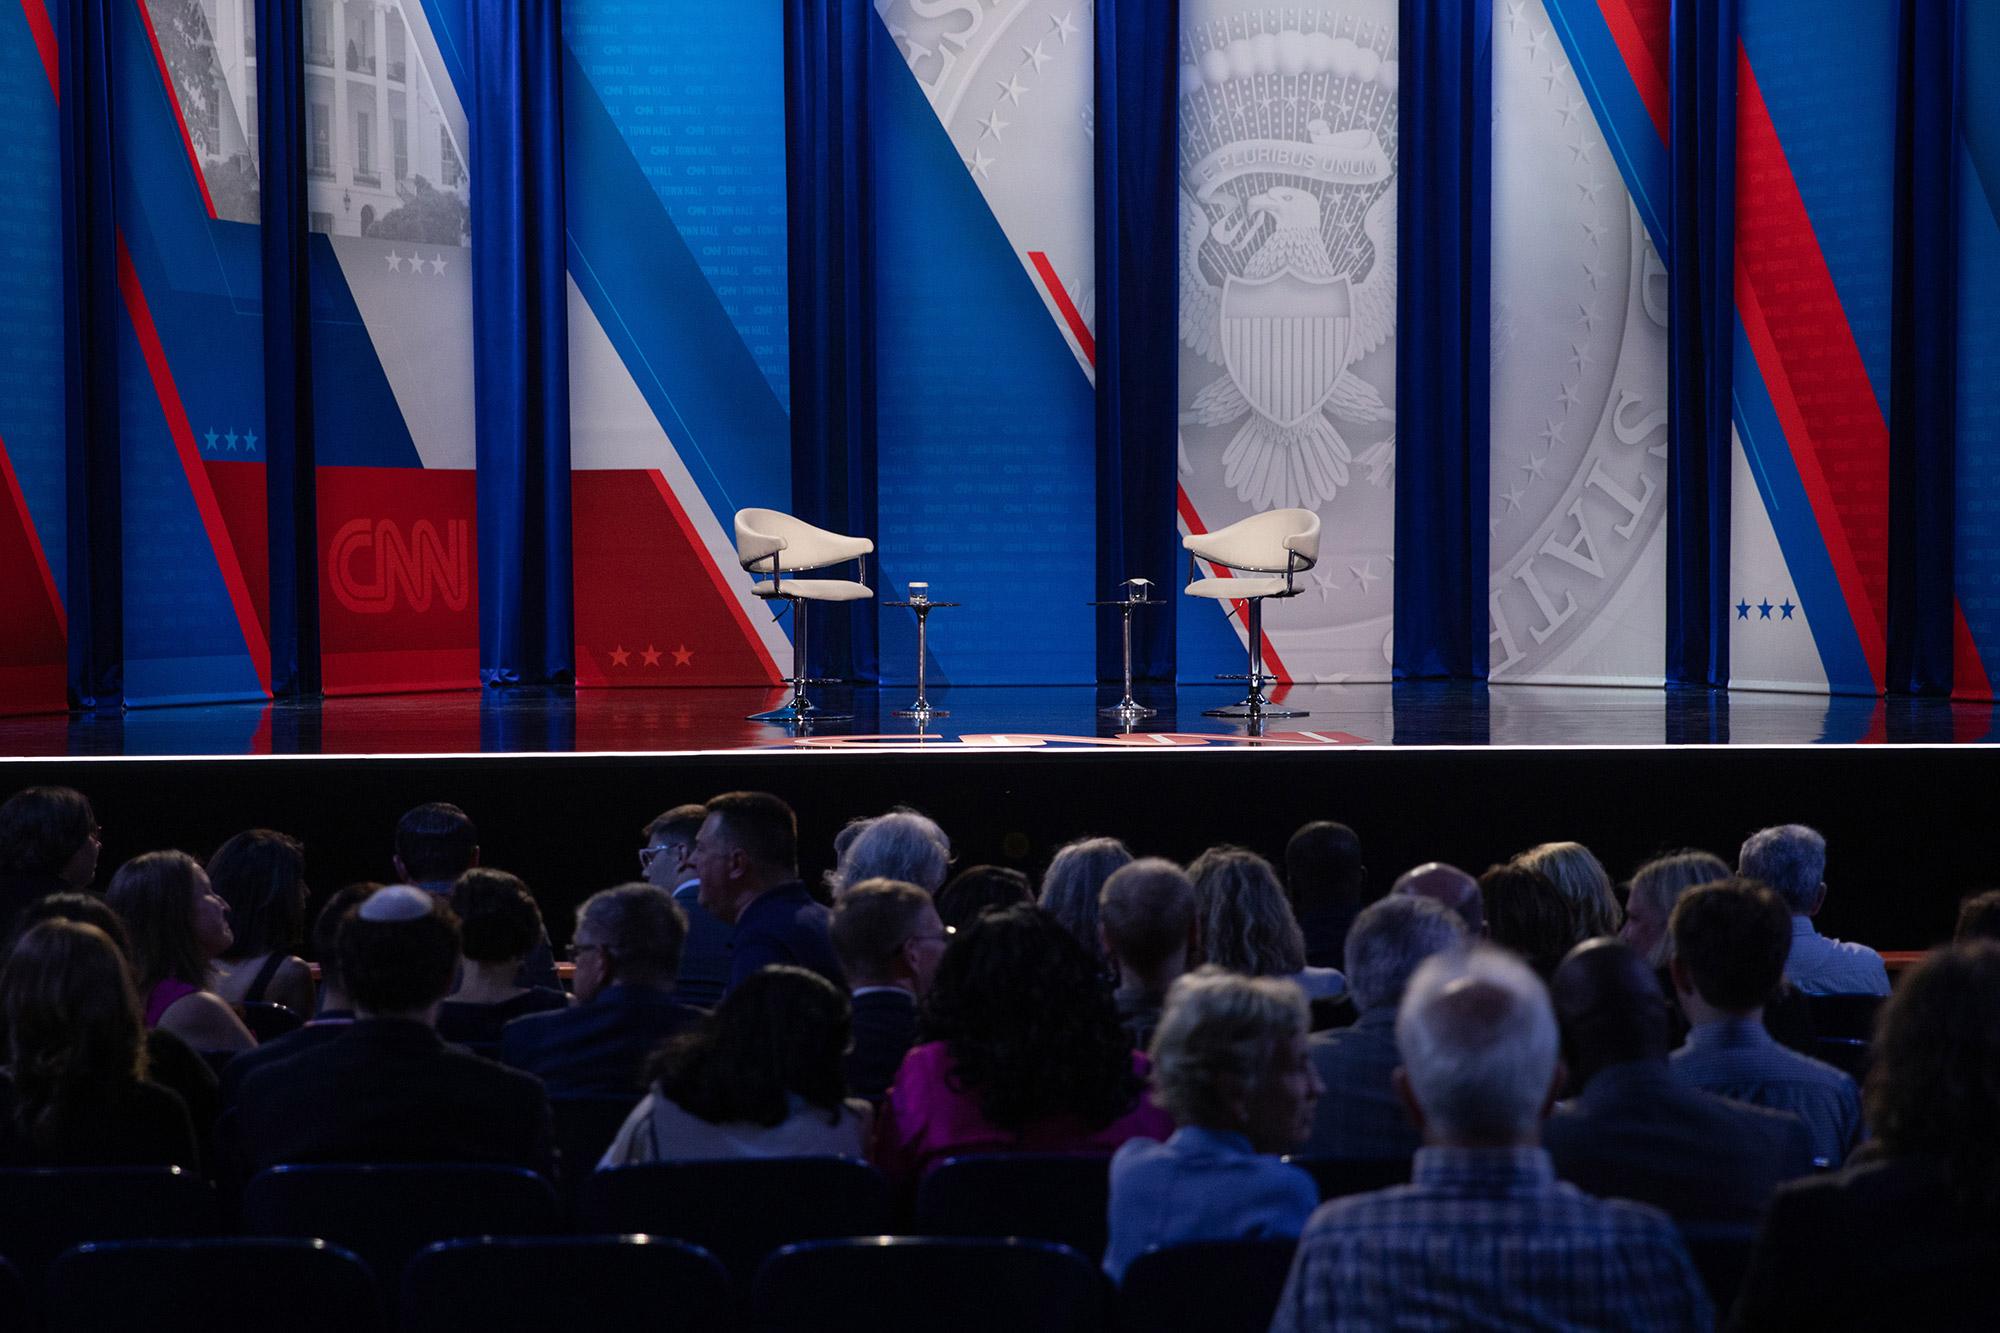 The stage is set for Biden's town hall at Mount St. Joseph University in Cincinnati, Ohio.